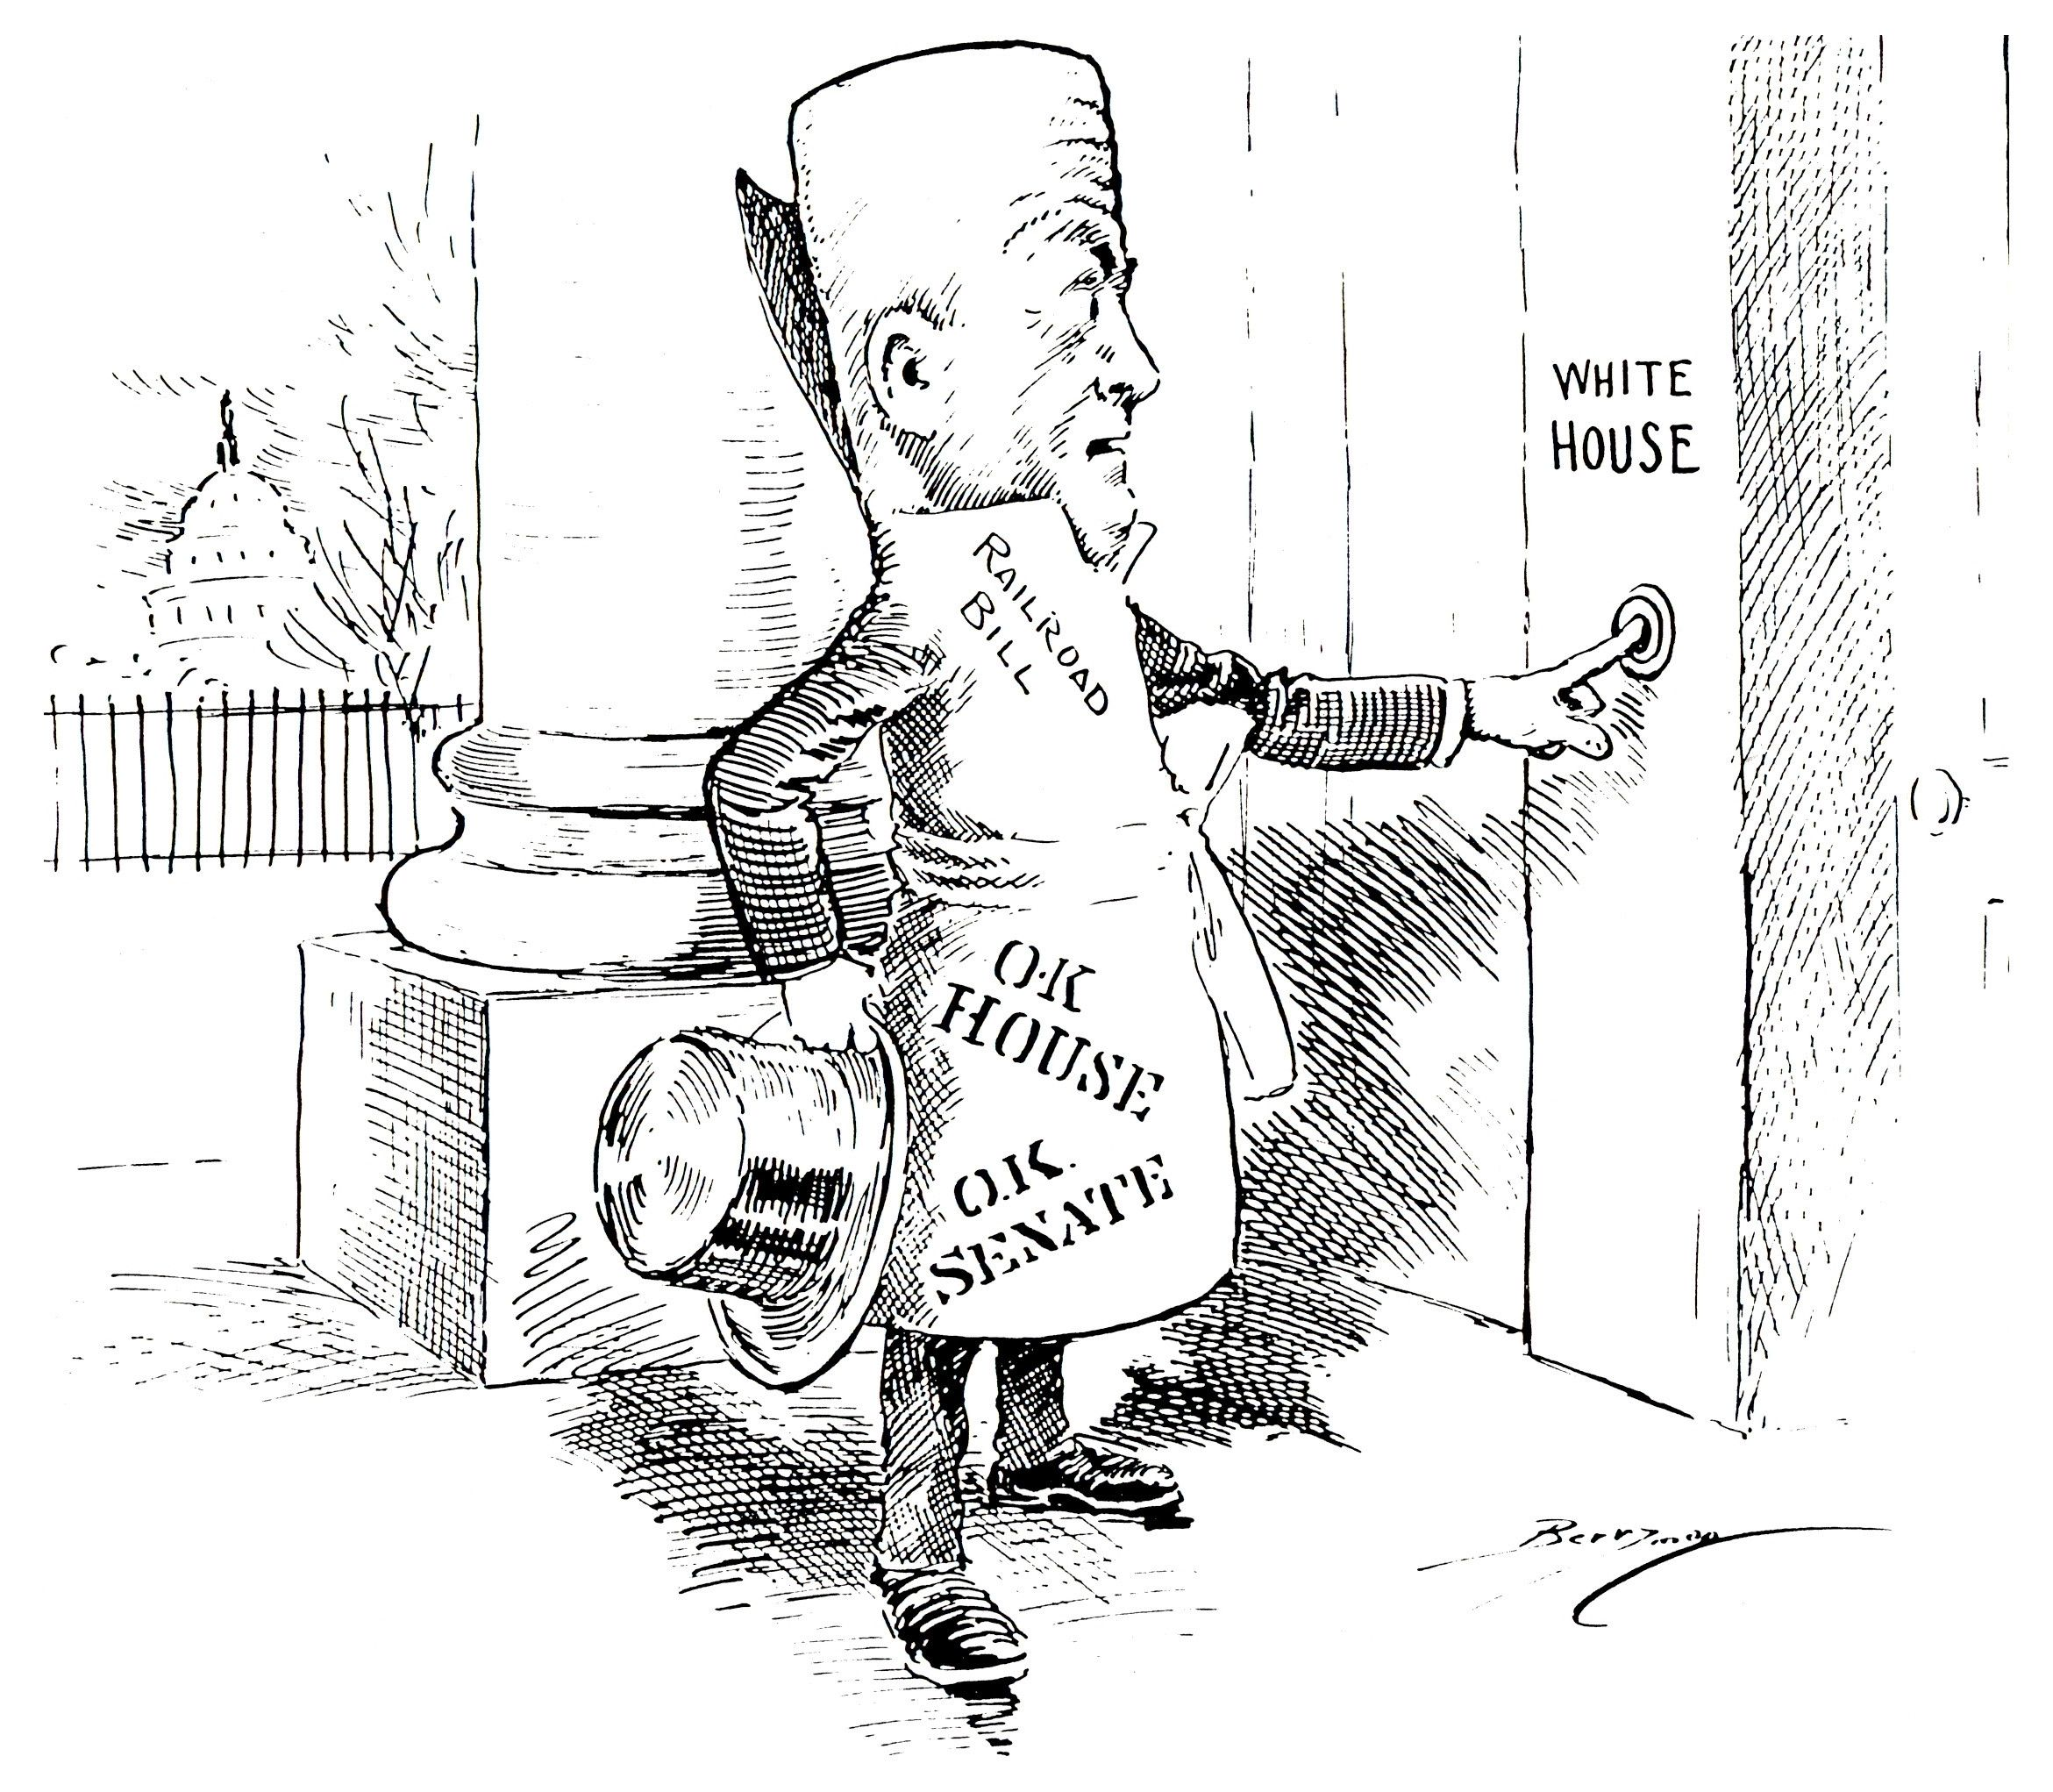 Bill ringing the White House doorbell